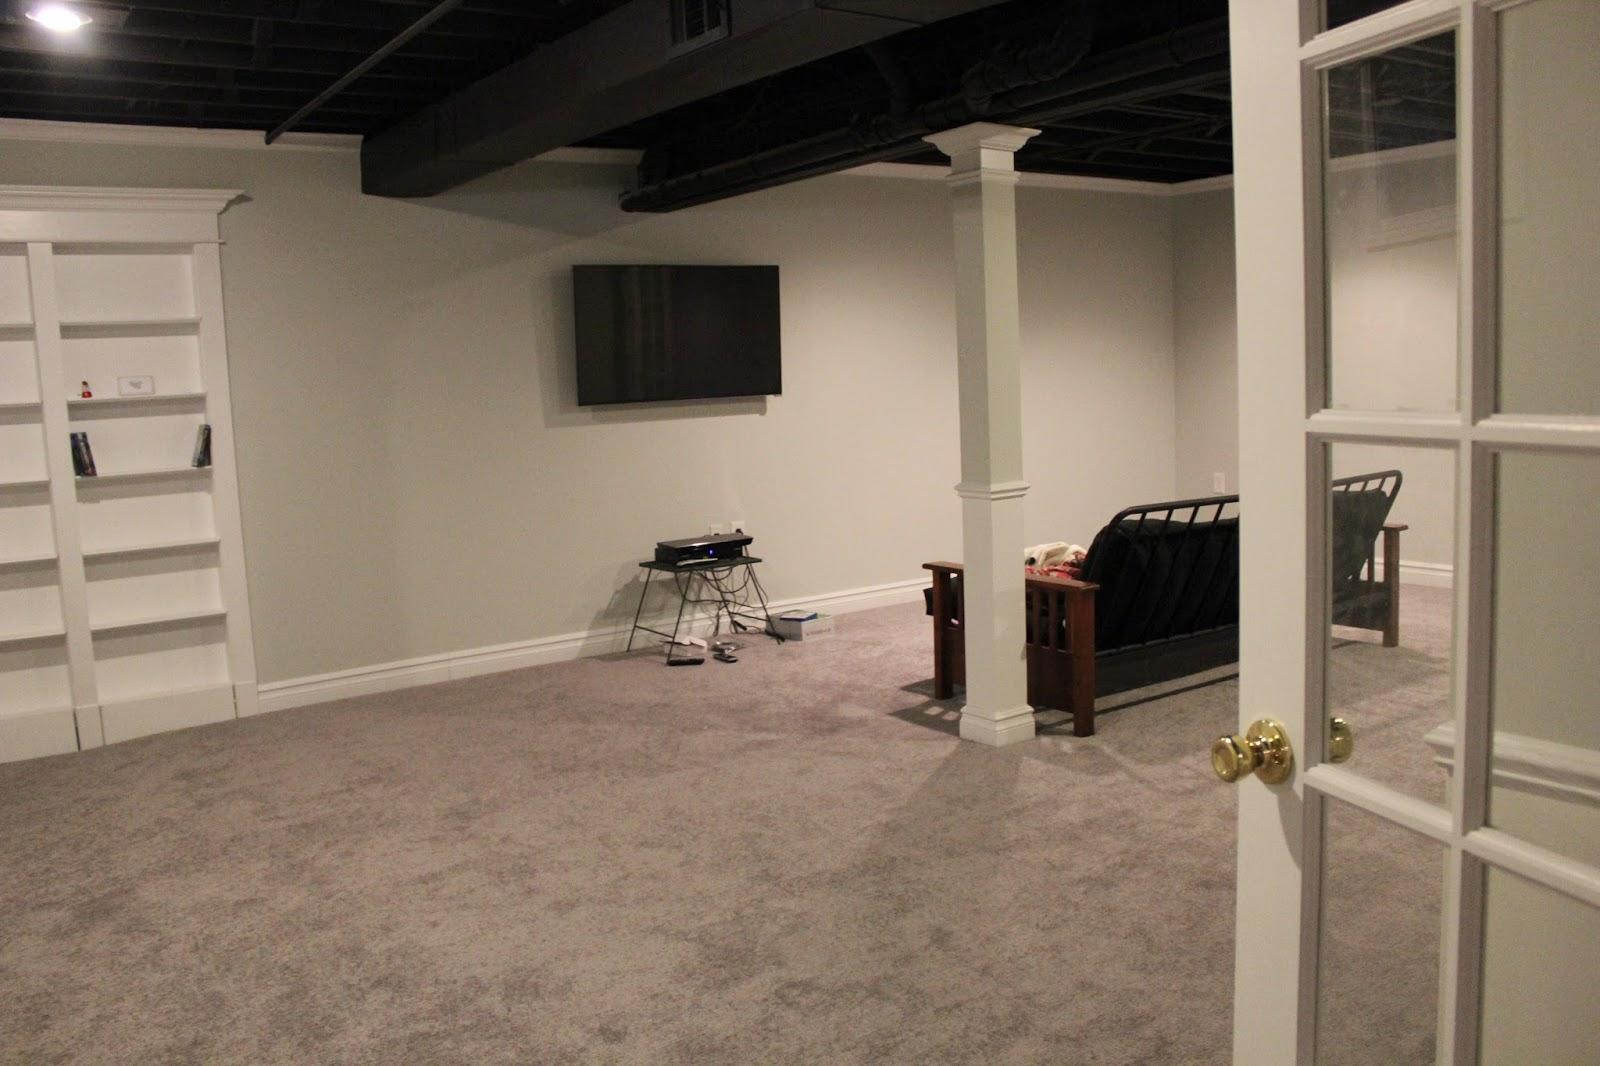 painted basement ceiling. Painted Basement Ceiling R